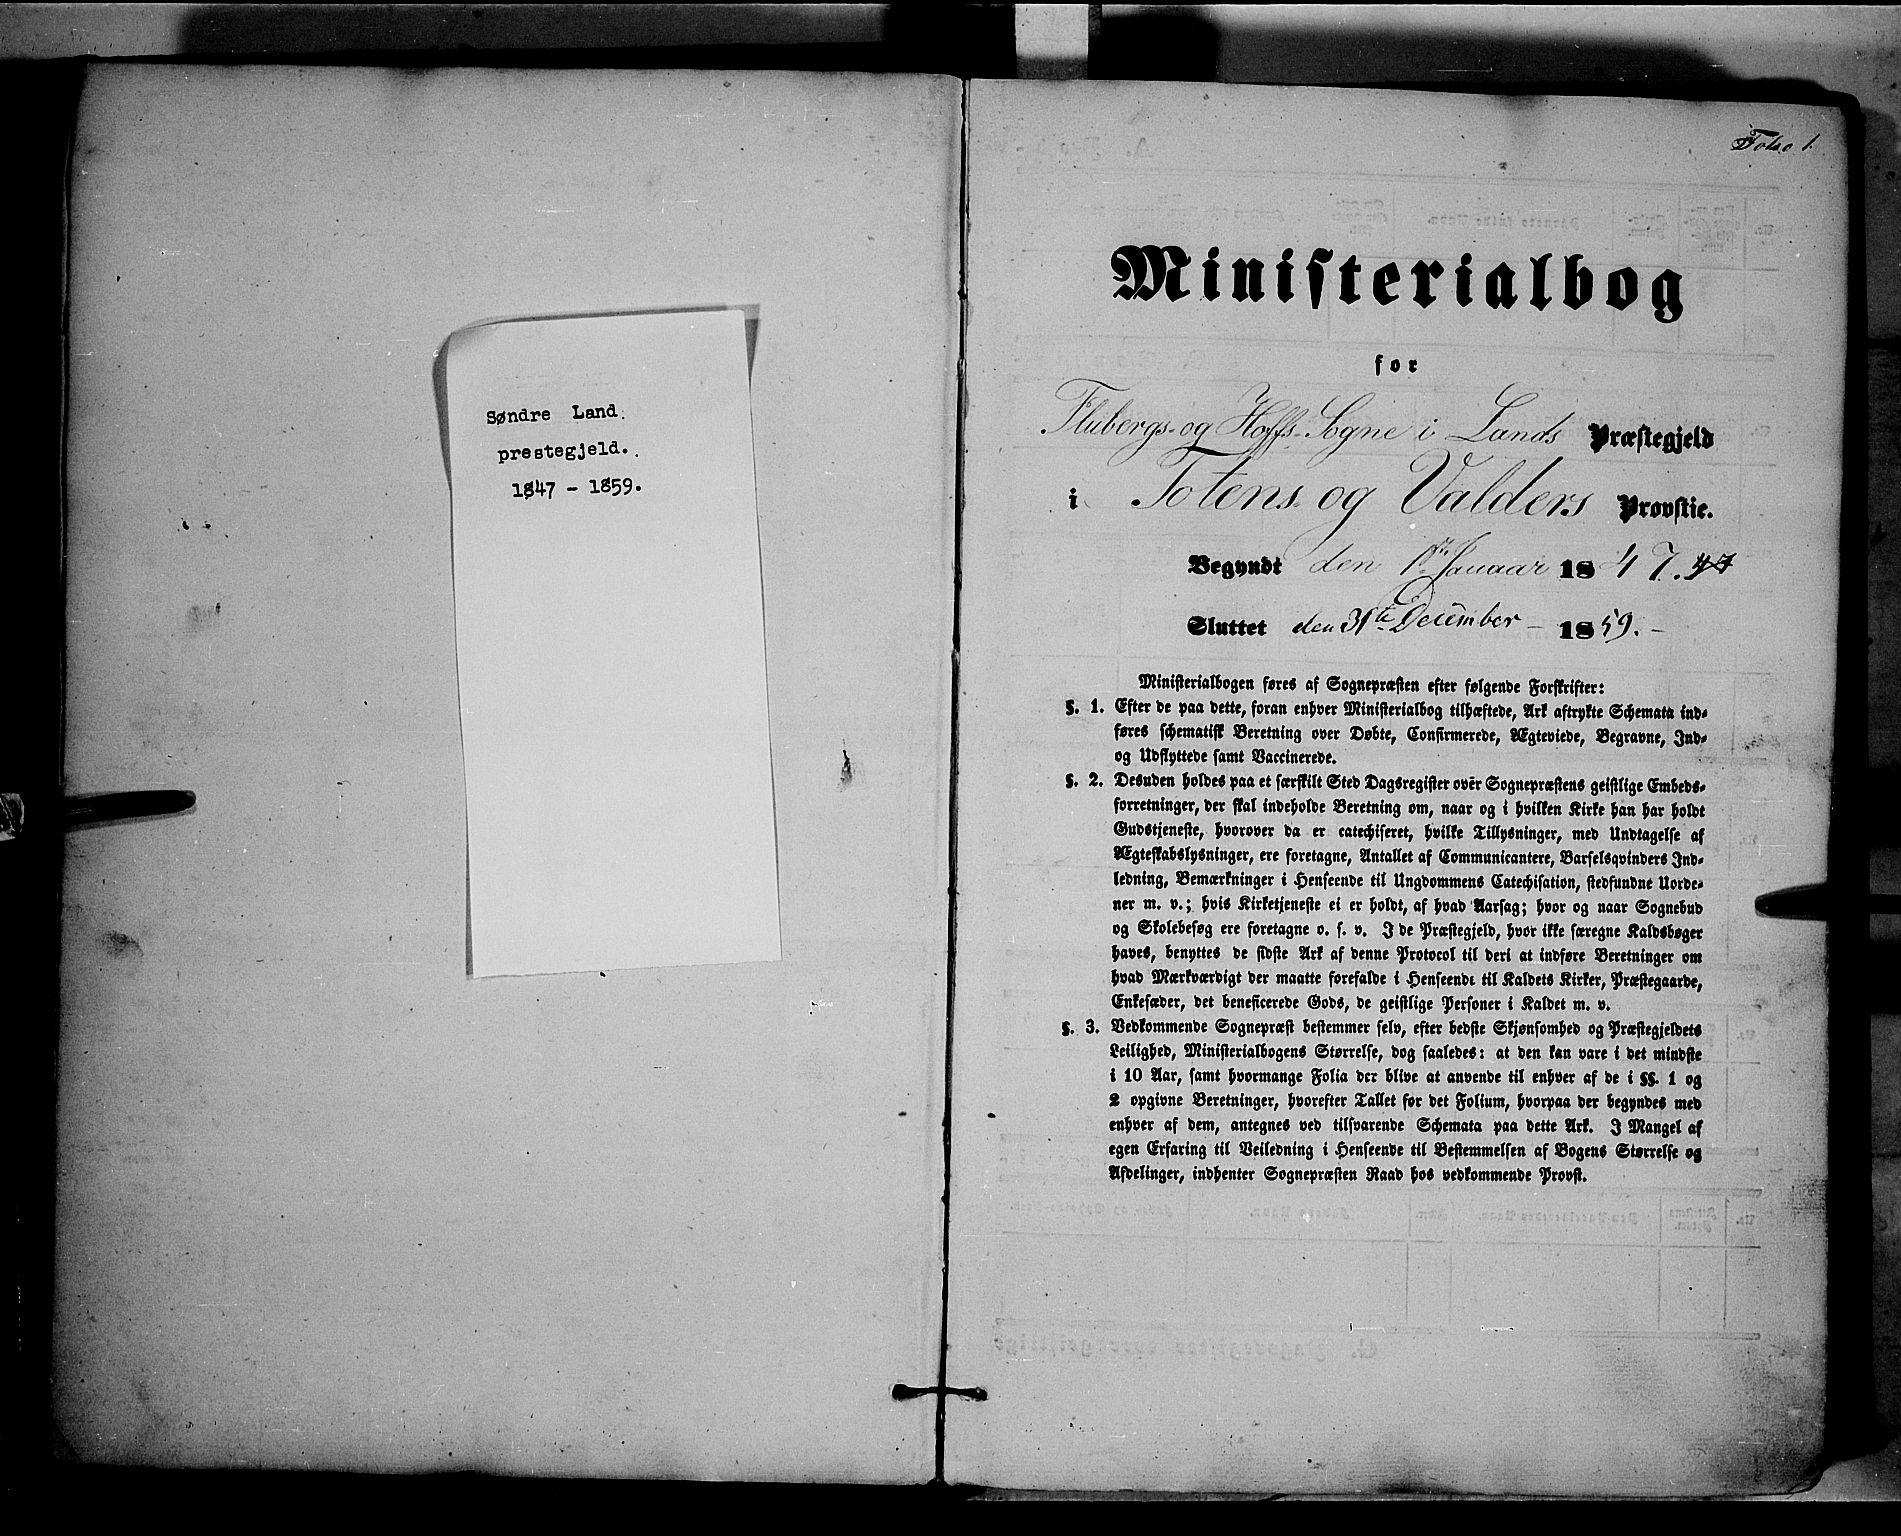 SAH, Land prestekontor, Ministerialbok nr. 9, 1847-1859, s. 1